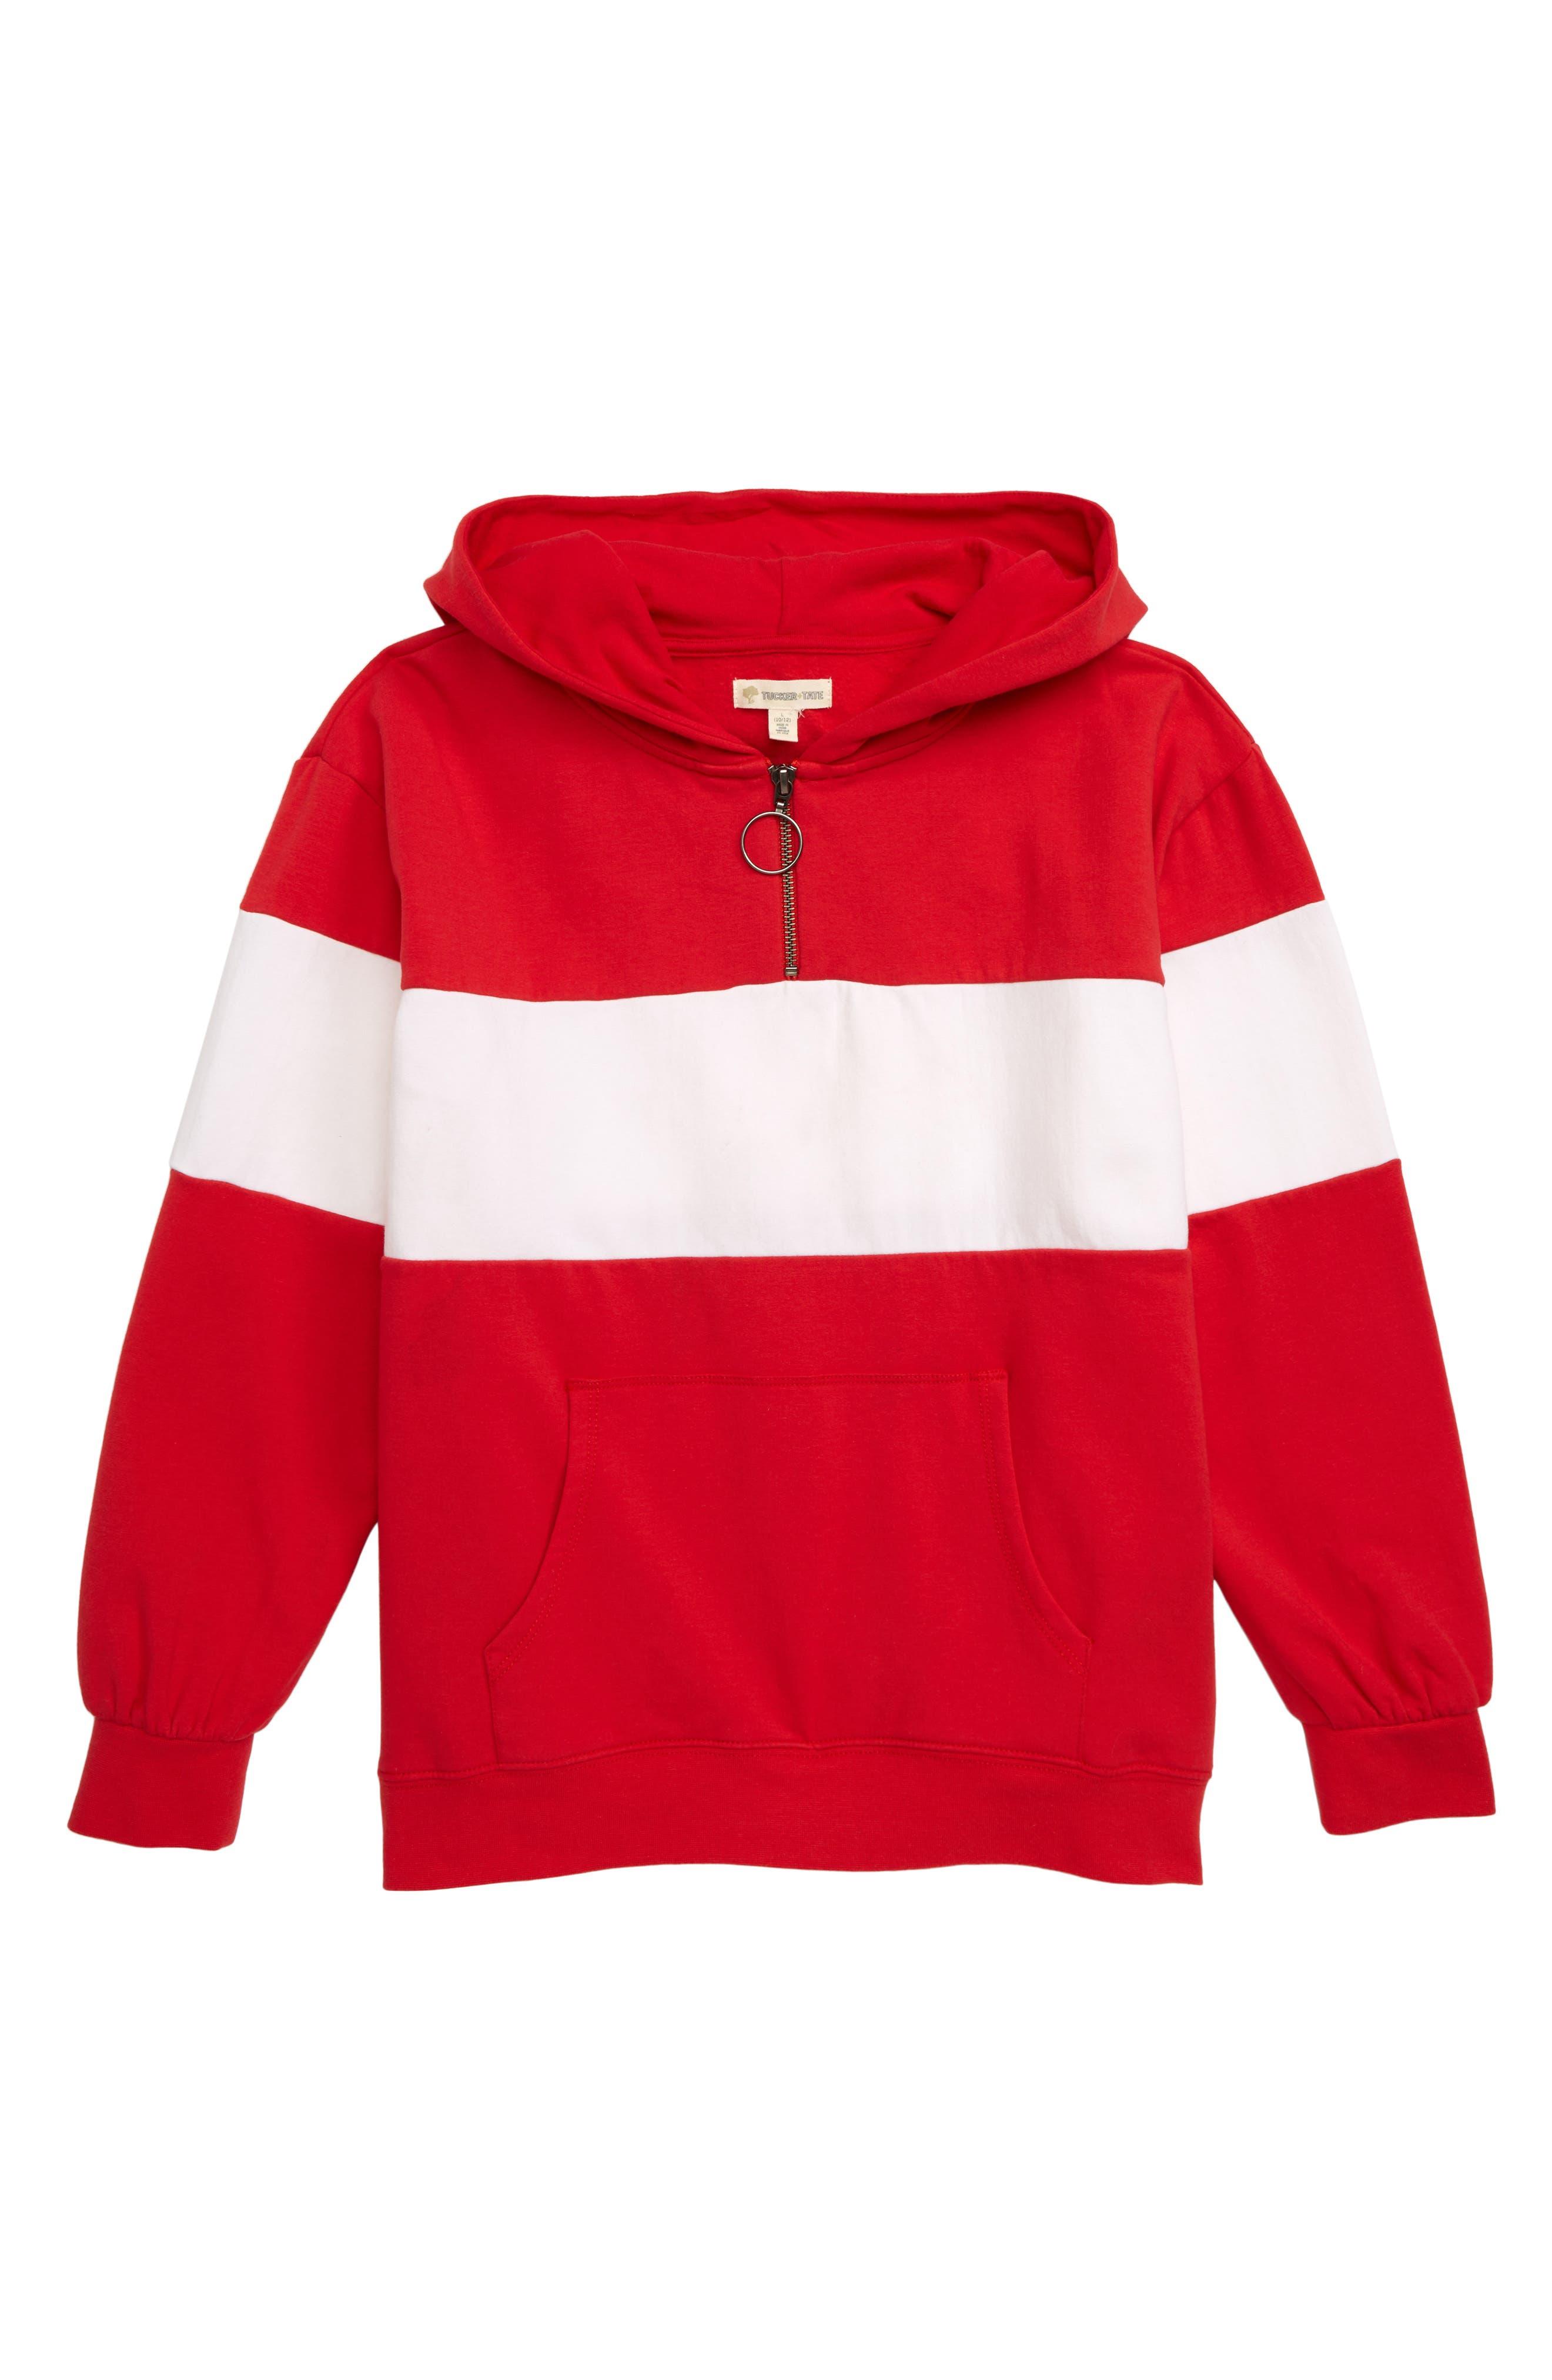 Colorblock Quarter Zip Hoodie, Main, color, RED PEPPER